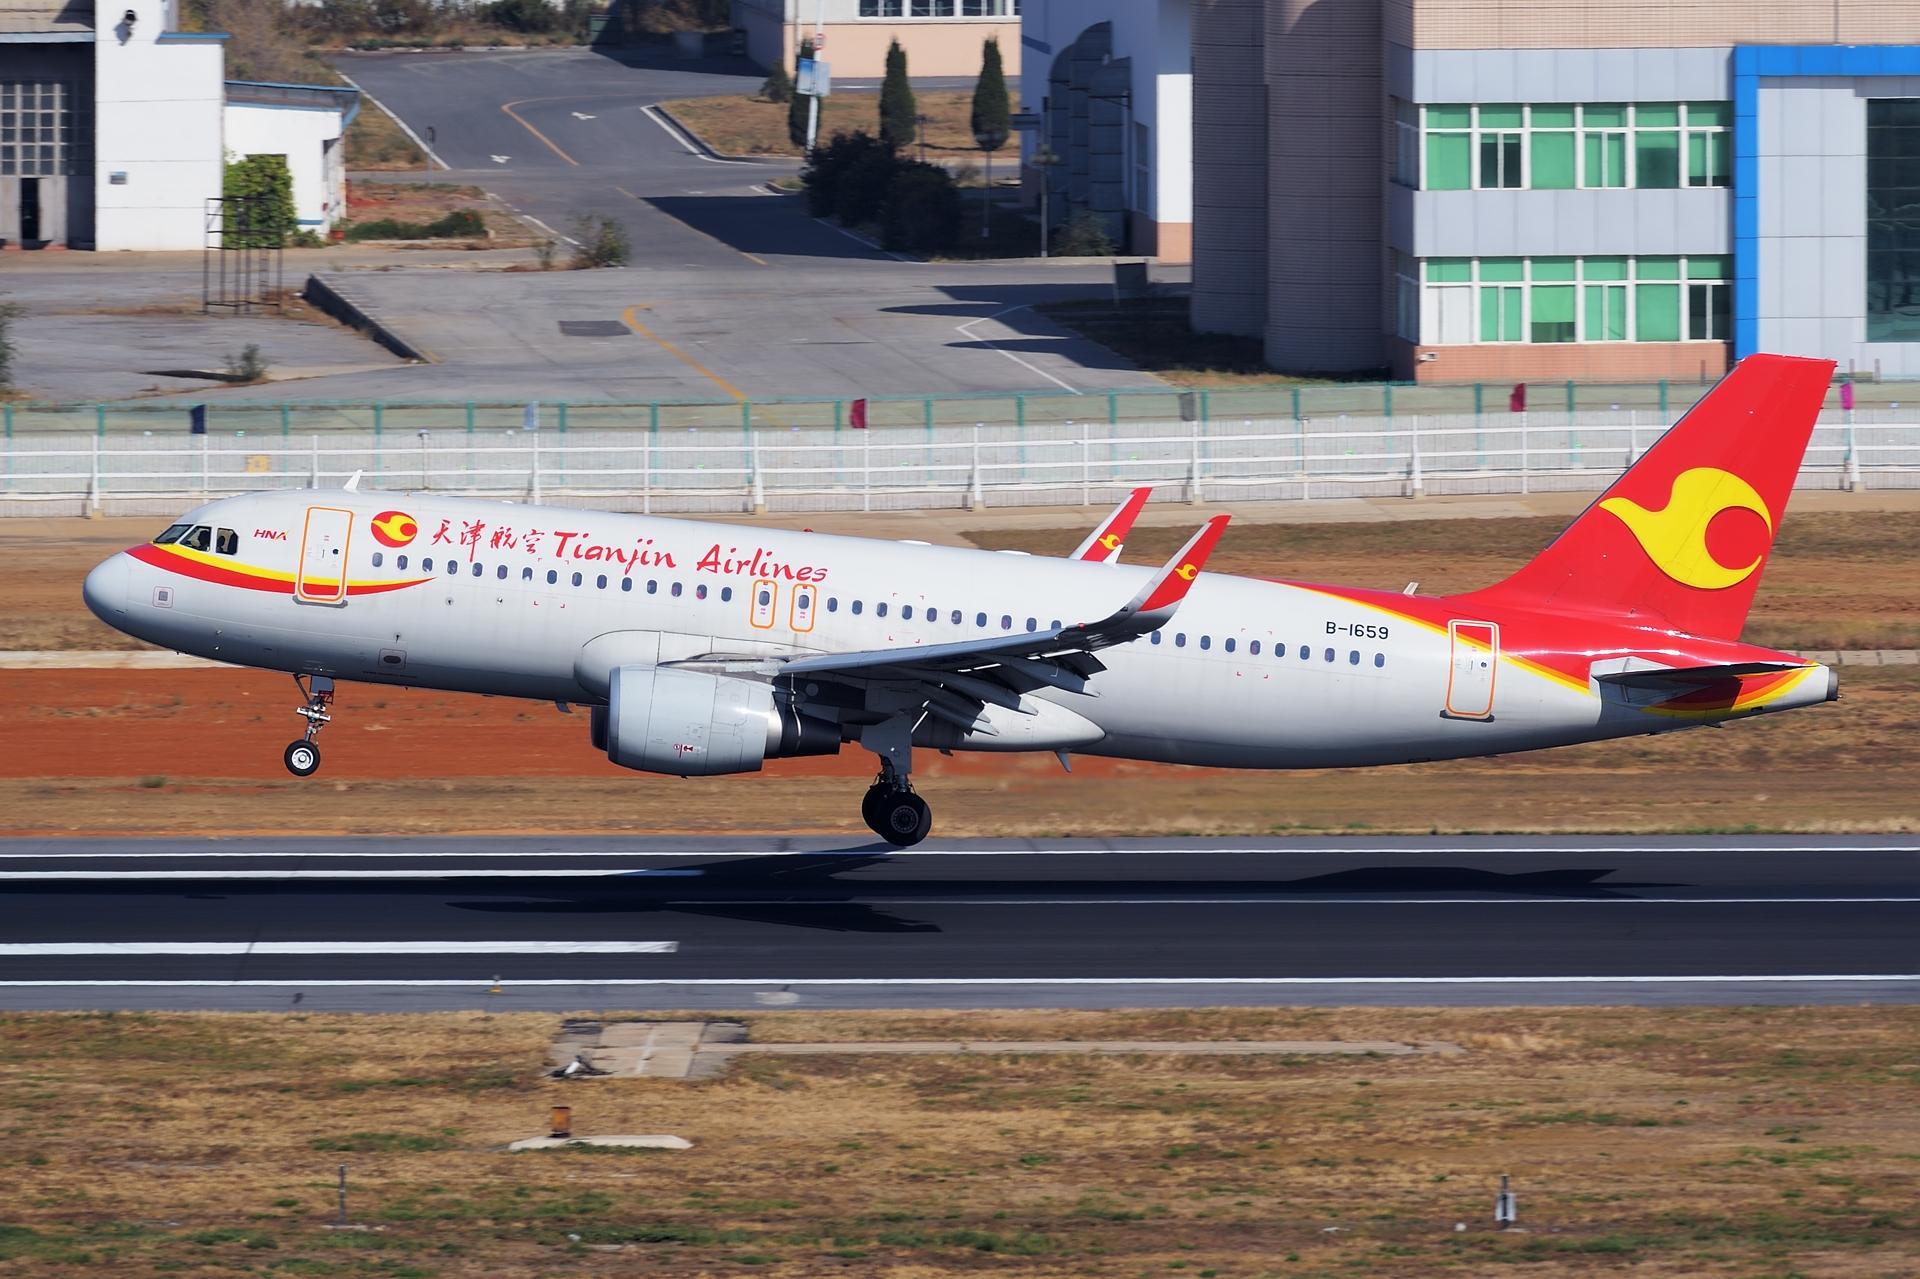 Re:[原创]★[DLC]2016年终总结(持续更新中)★ AIRBUS A320-200 B-1659 中国大连国际机场